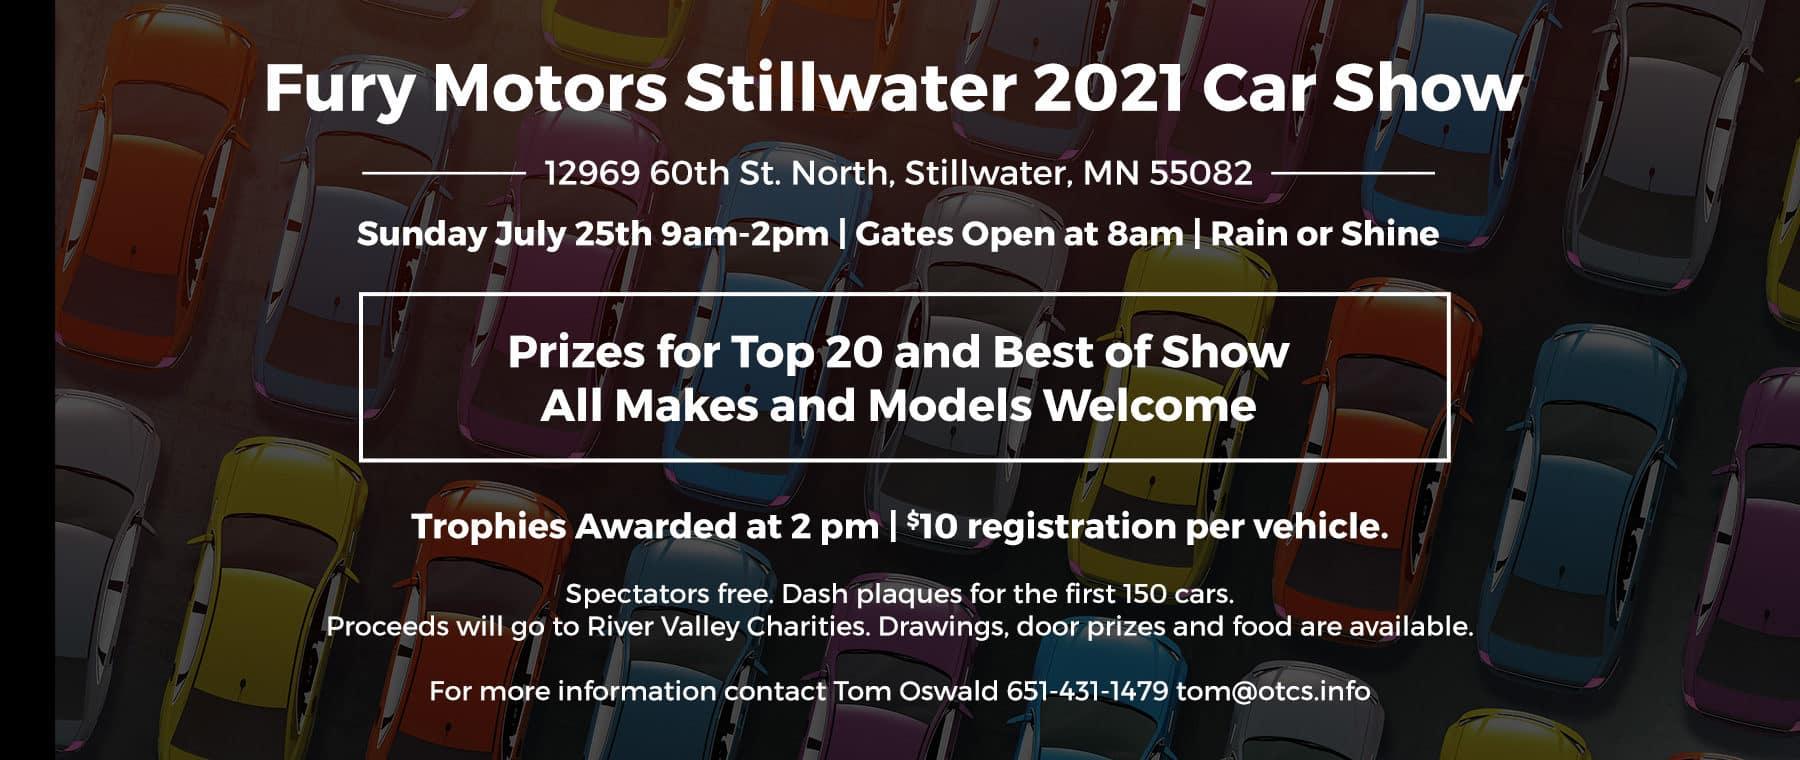 Fury Motors Stillwater 2021 Car Show | 12969 60th St. North, Stillwater, MN 55082